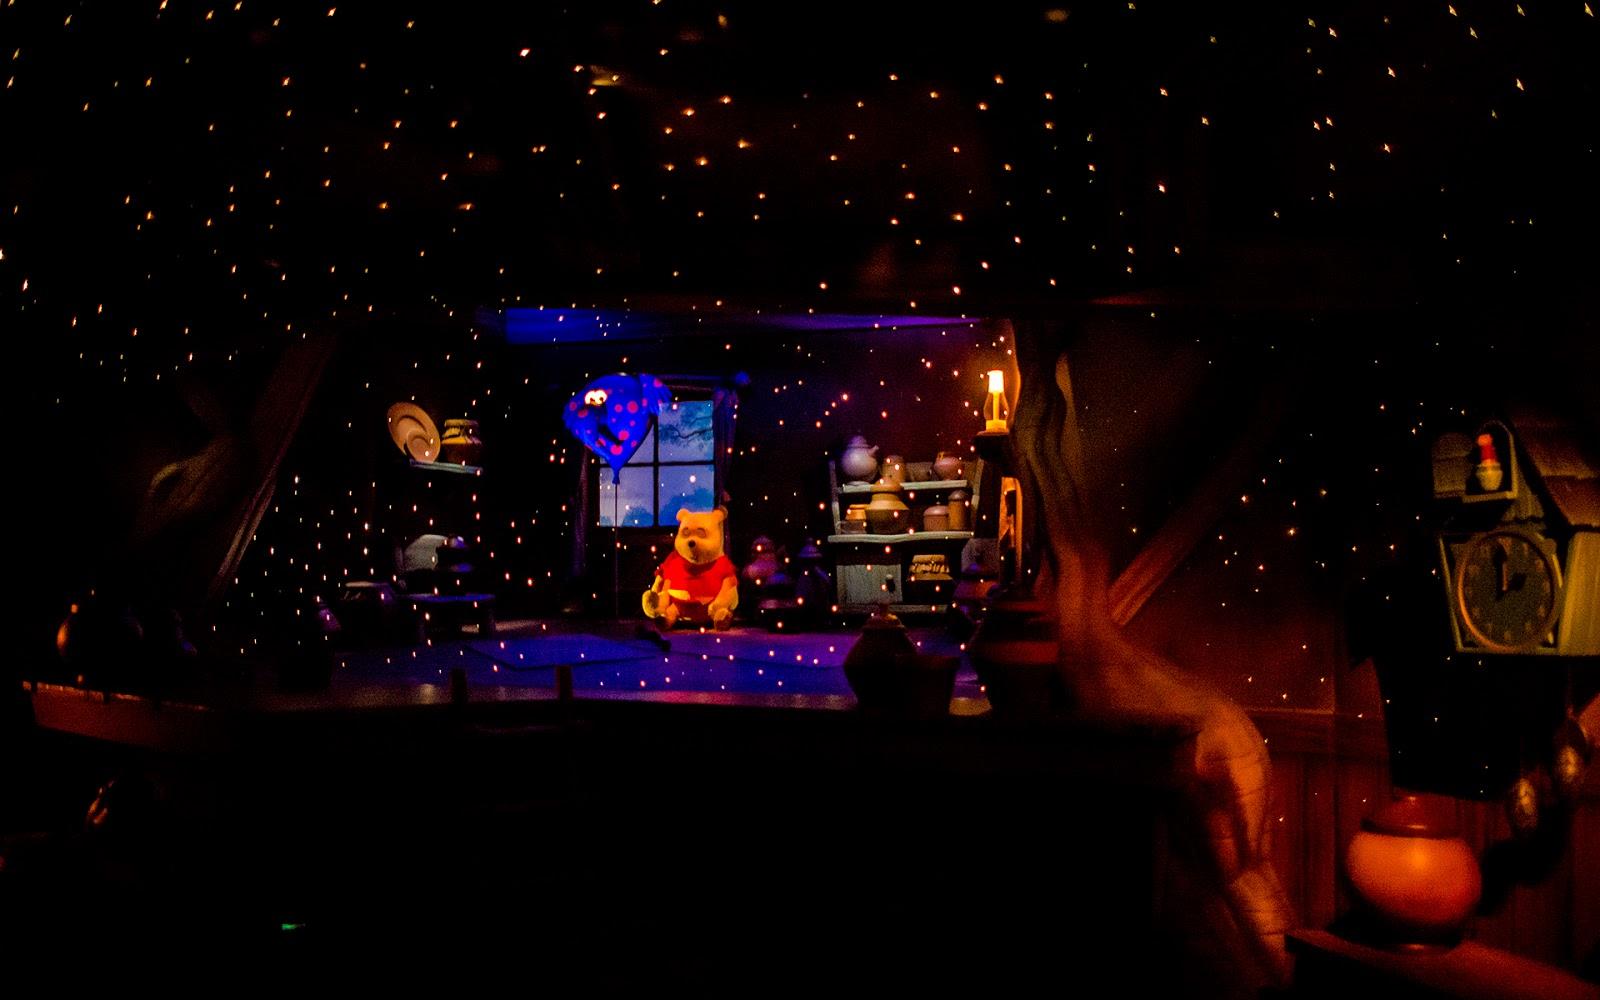 Disney Escape Room Uwgb